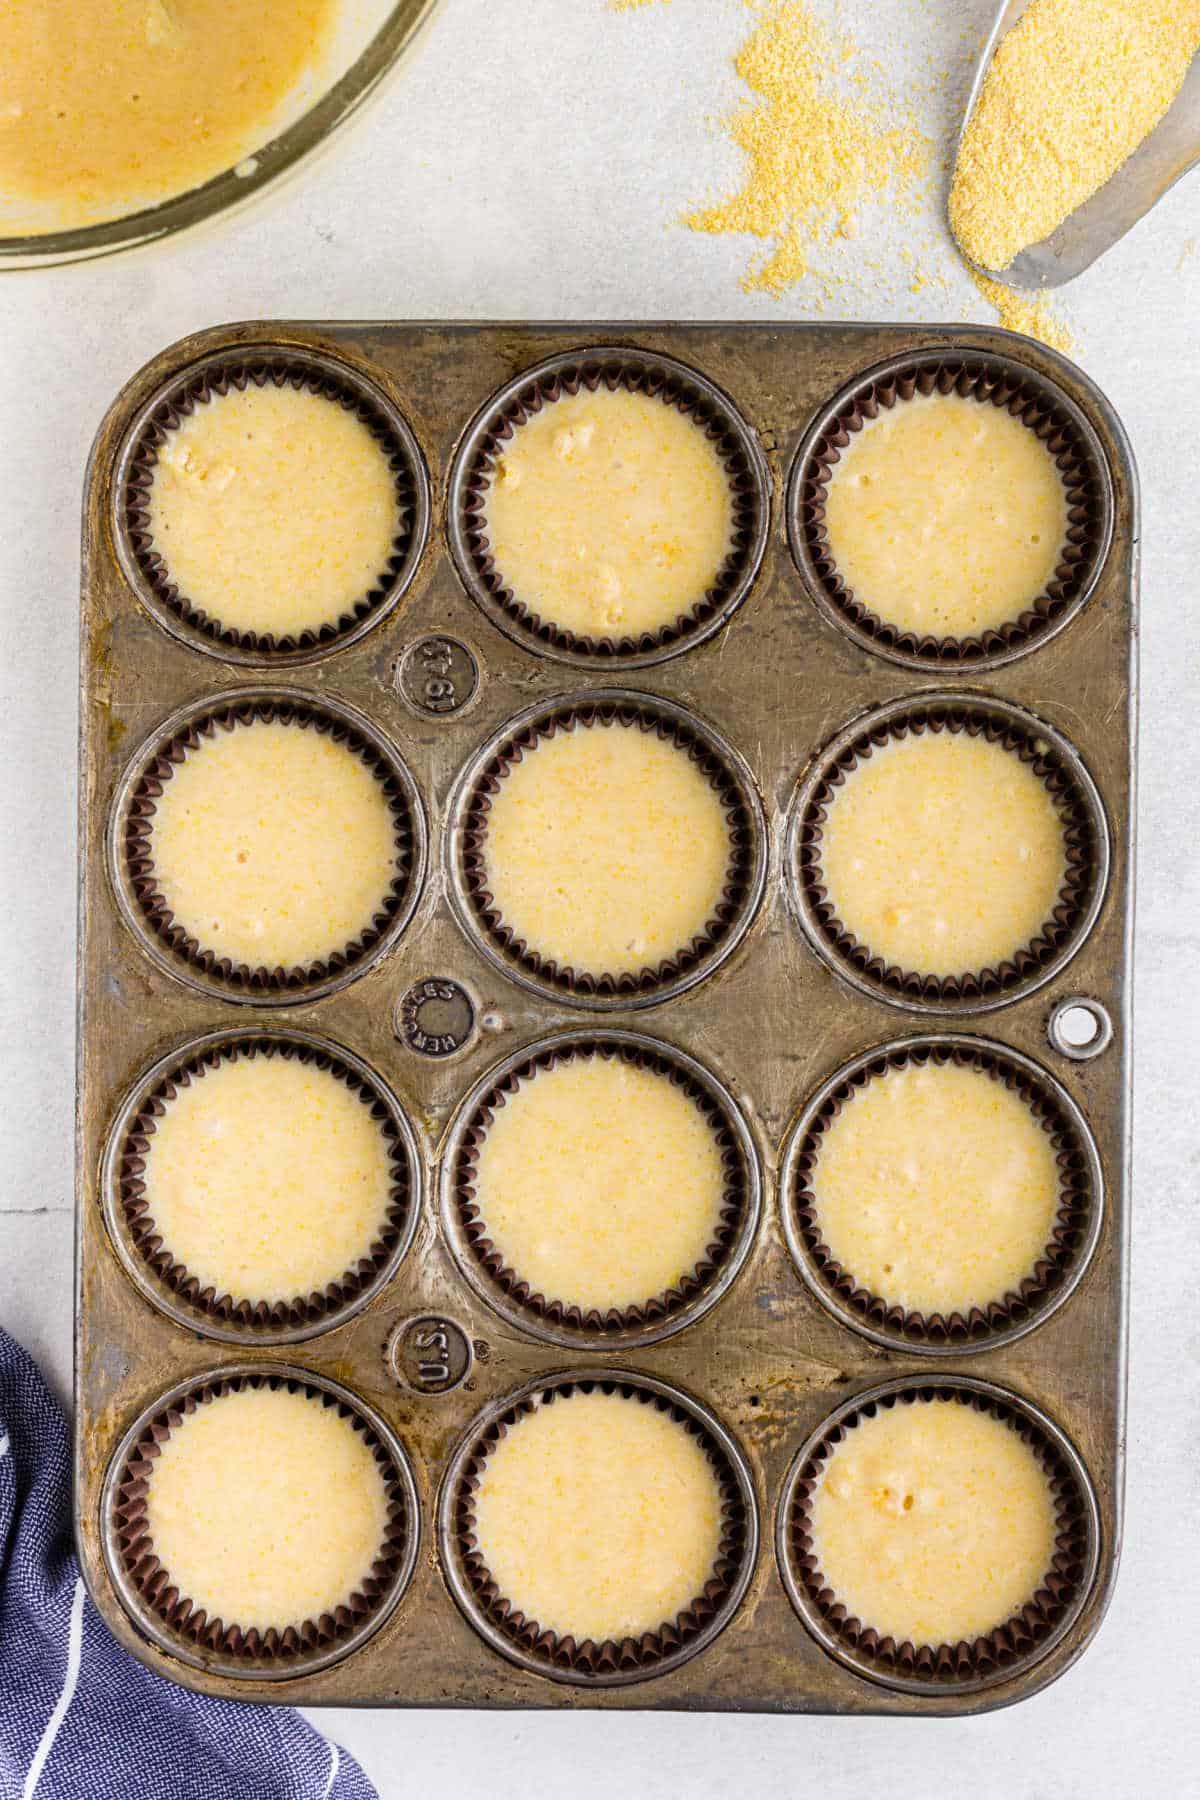 Cornbread muffin batter in a muffin tin.